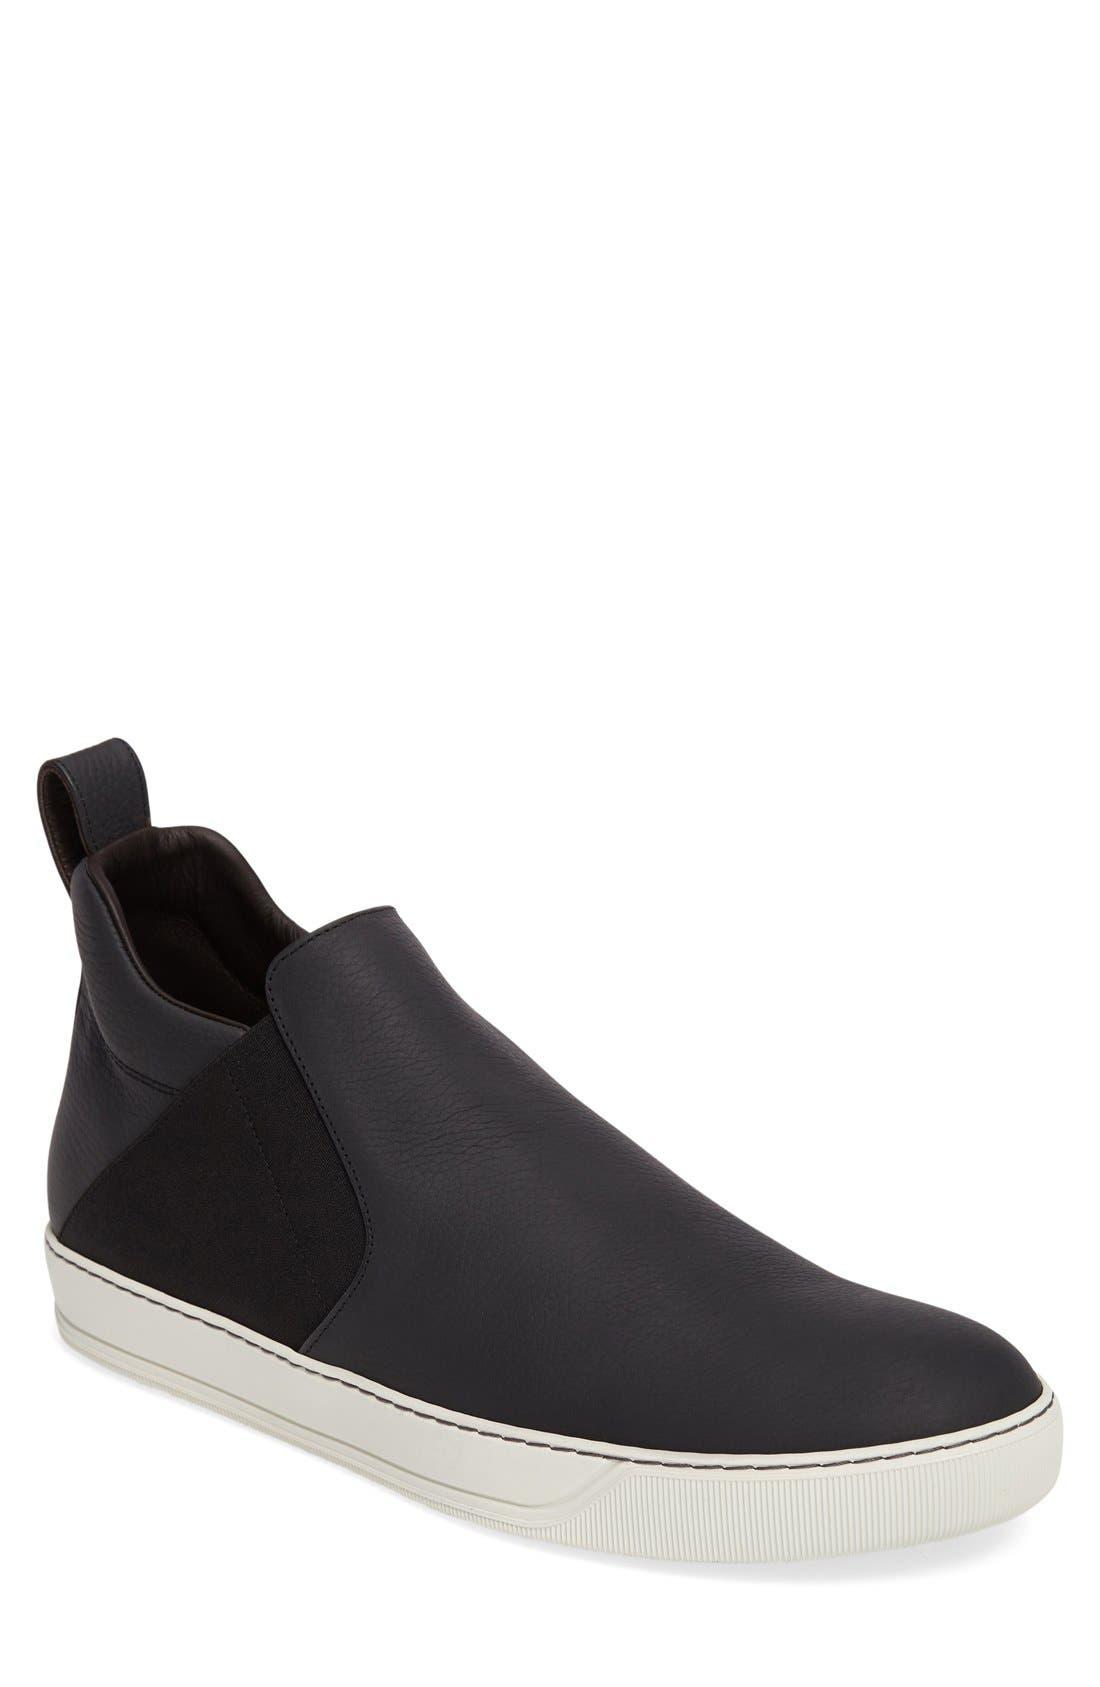 Main Image - Lanvin Mid Slip-On Sneaker (Men)